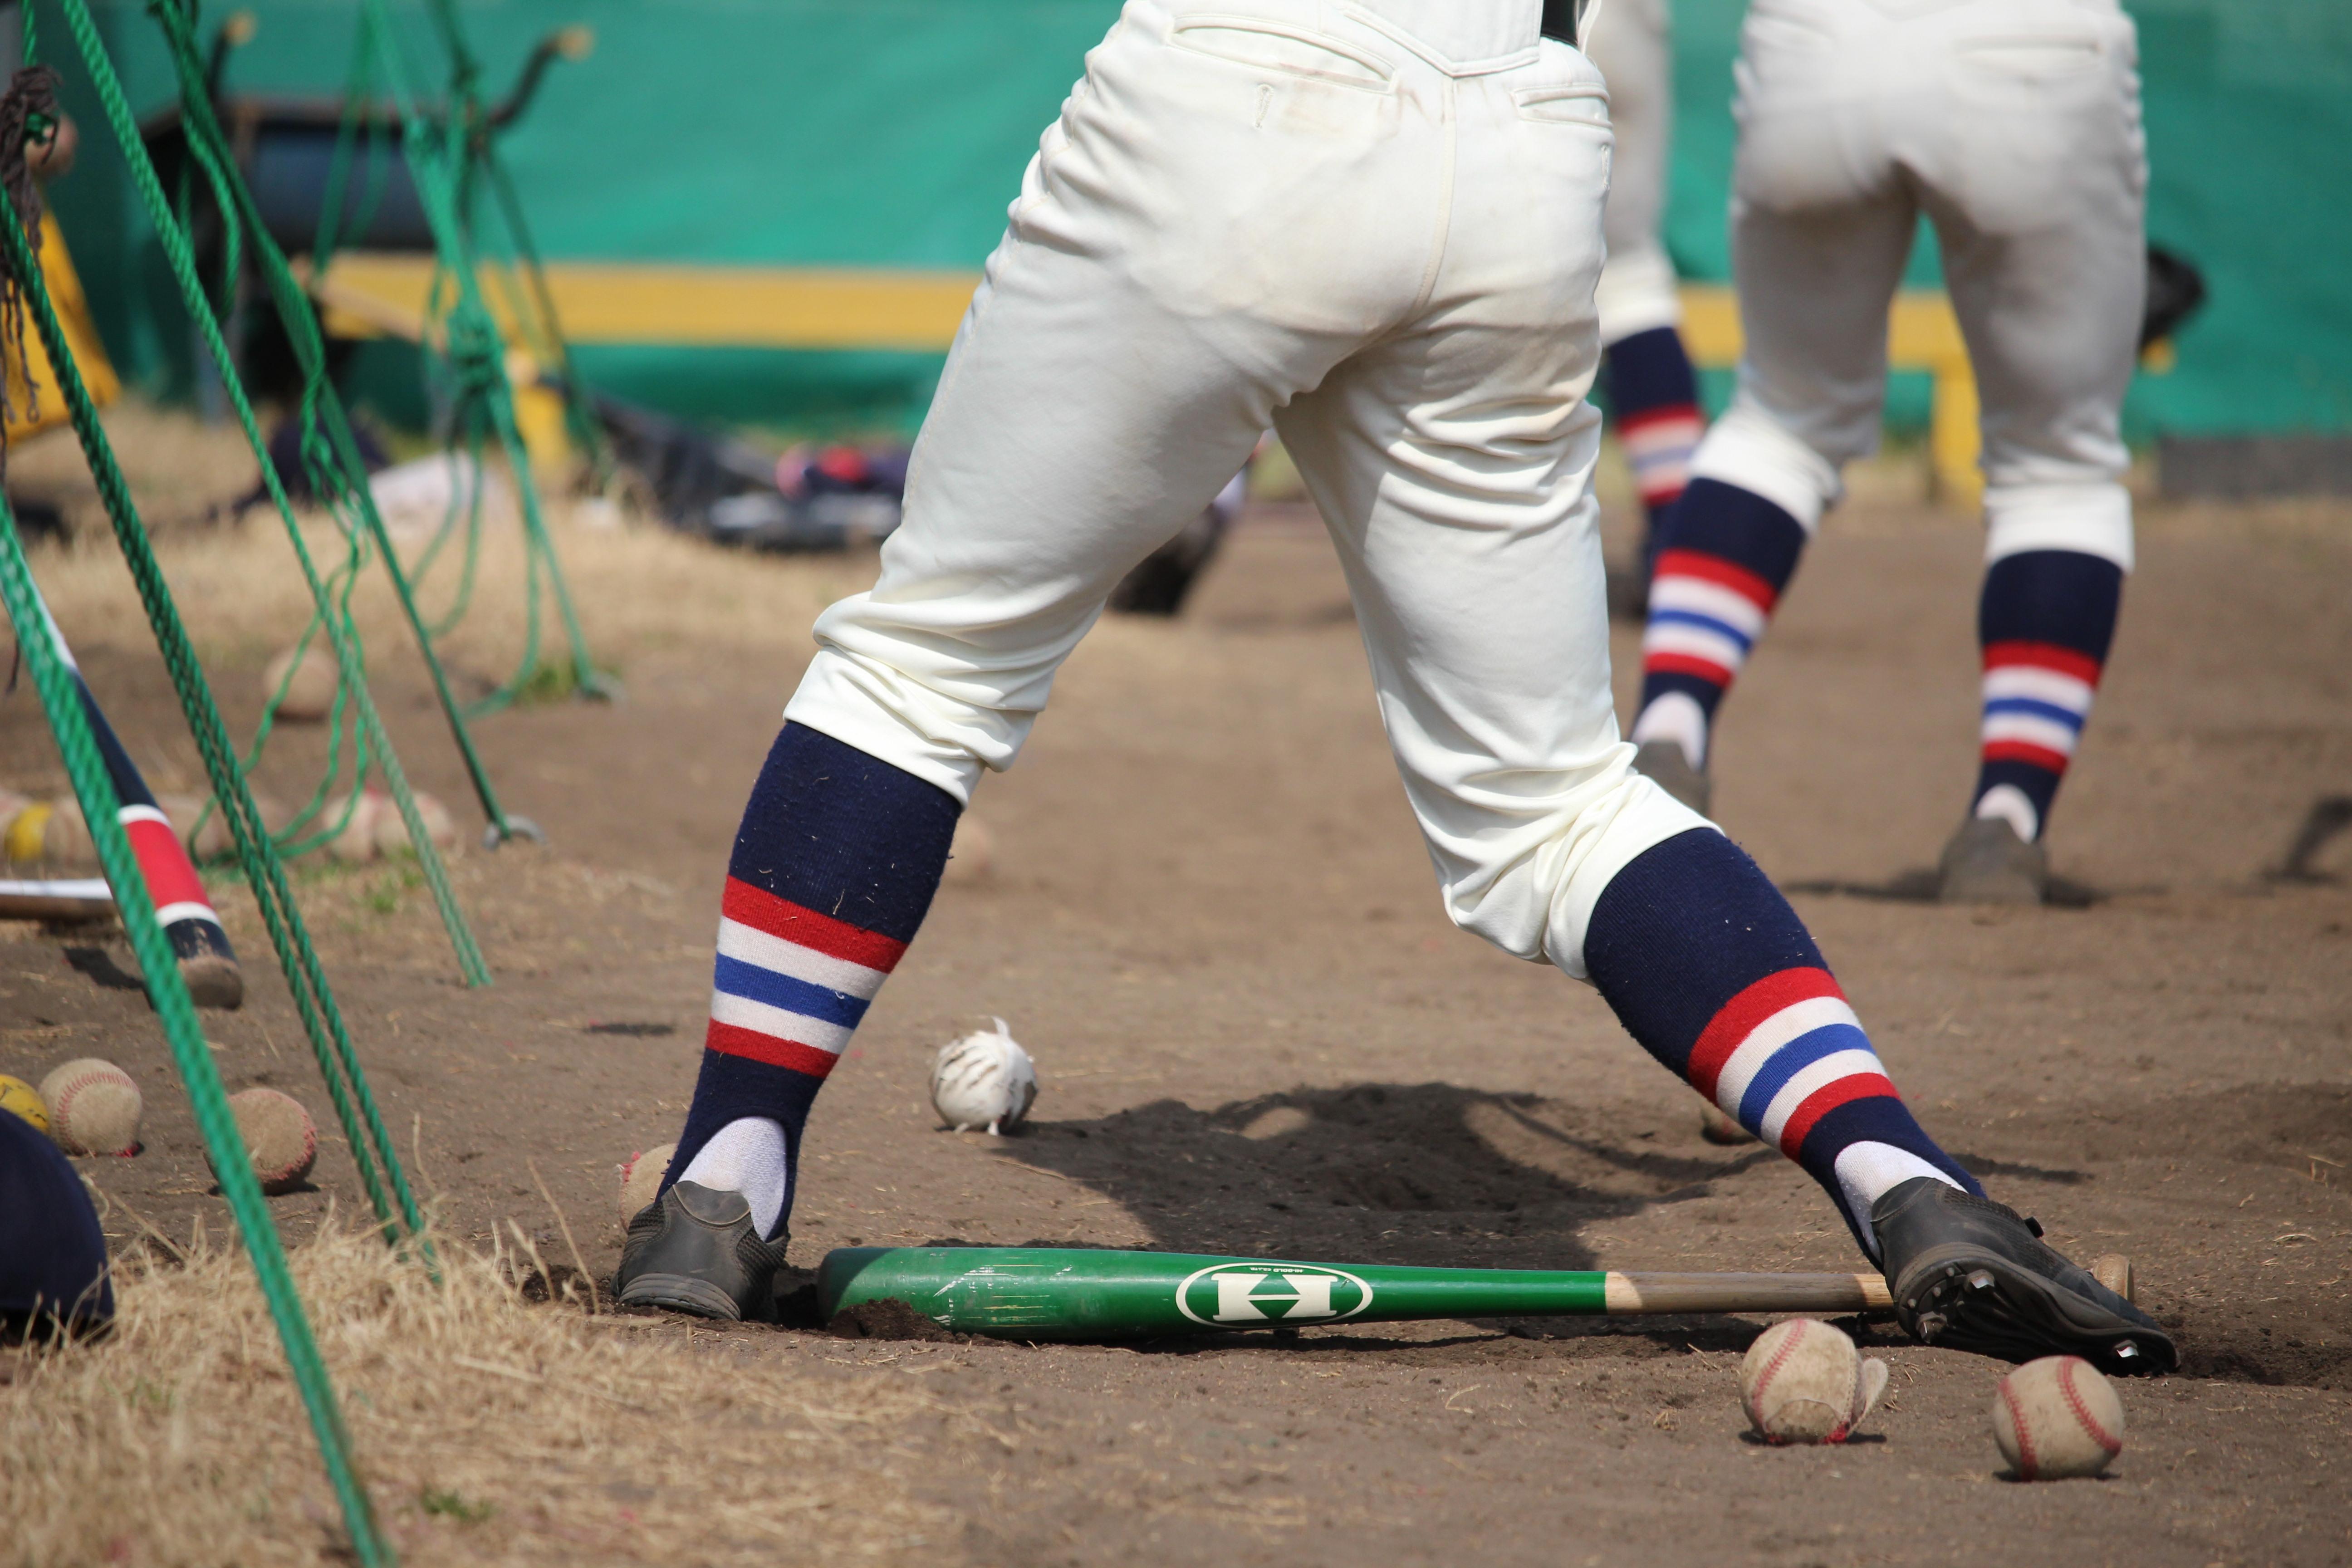 【柏木学園 野球部】江ノ島ラン